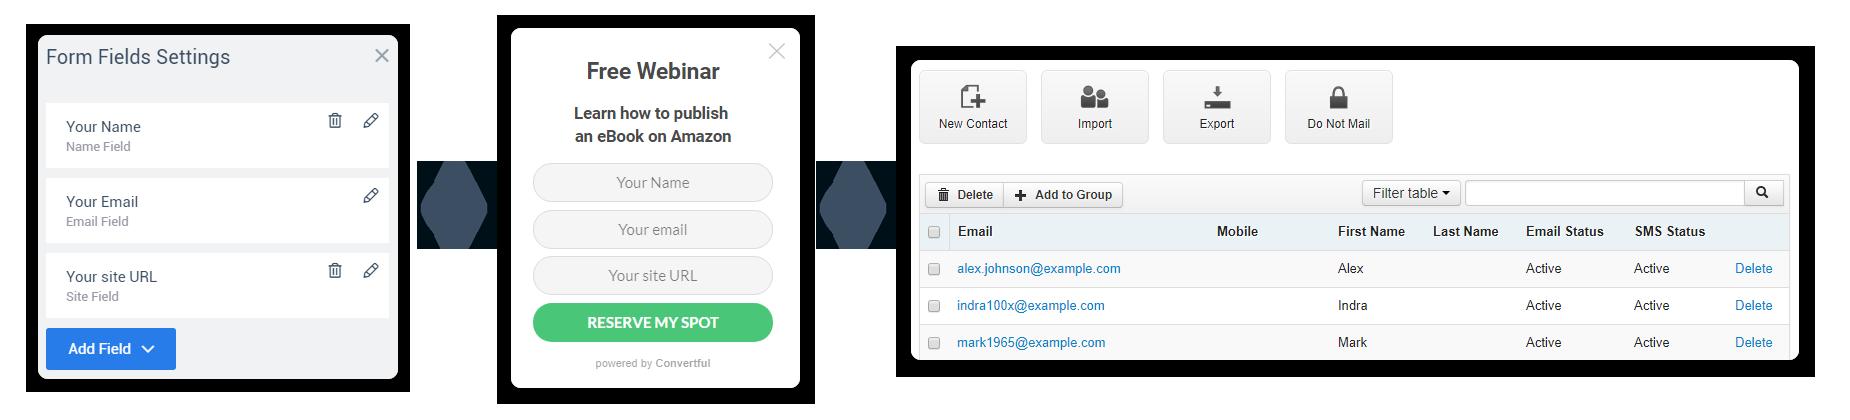 ActiveTrail integration custom fields support